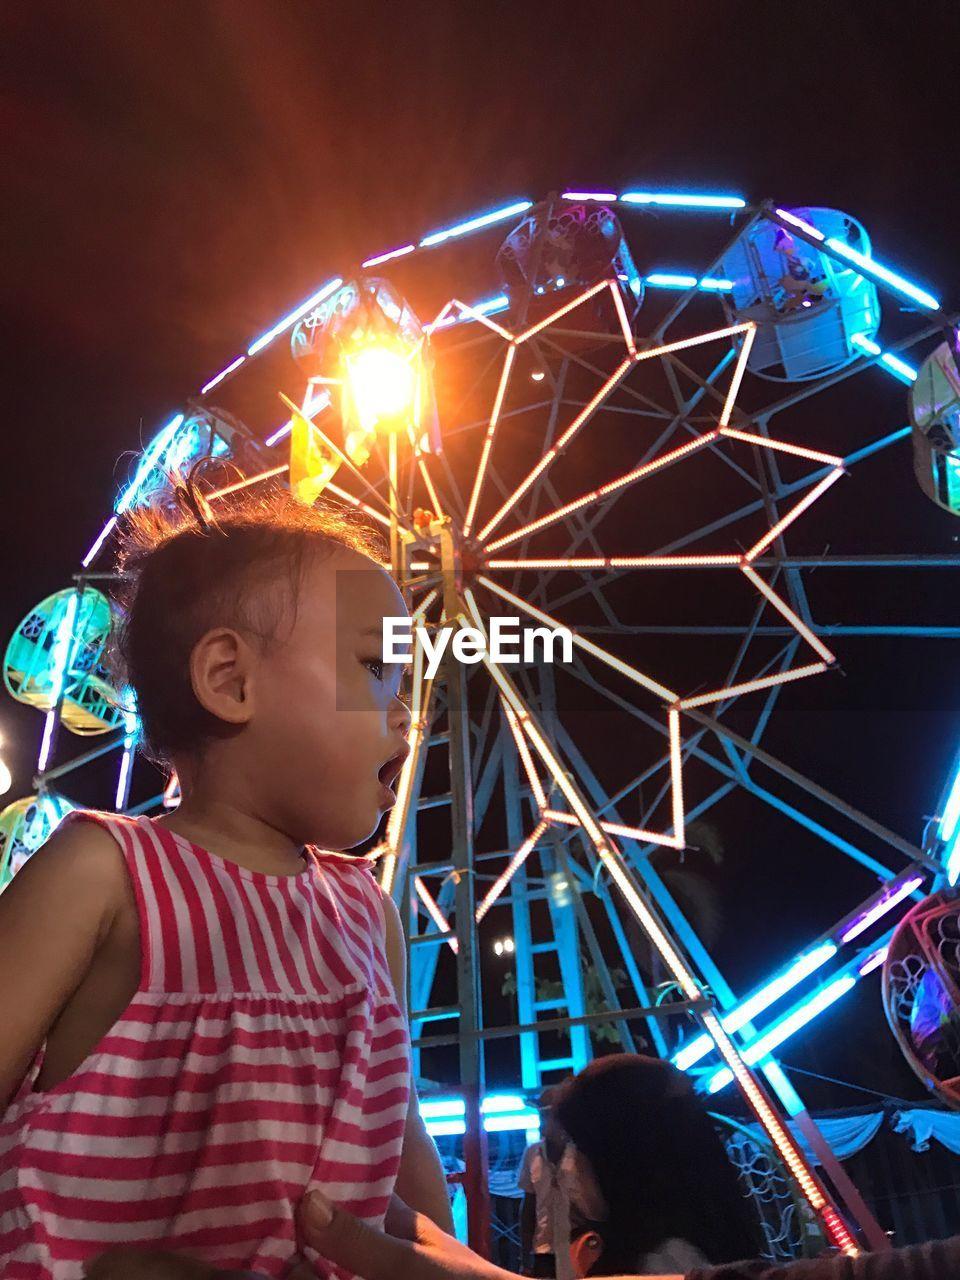 Cute Girl Against Ferris Wheel At Night